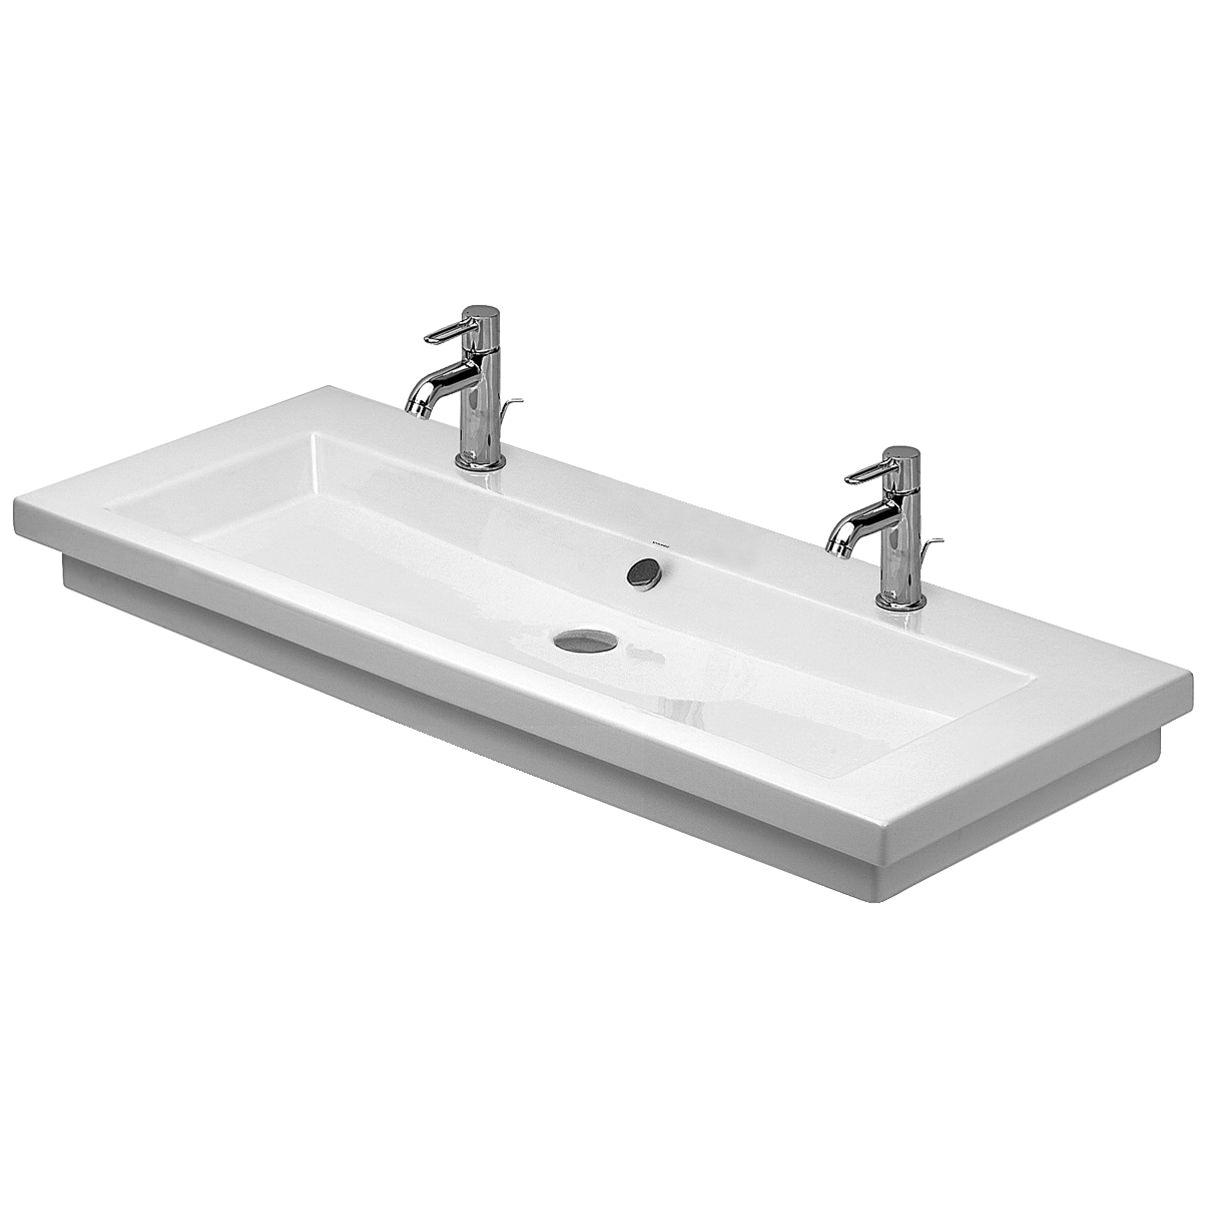 duravit 2nd floor 1200 x 505mm 2 tap holes ground. Black Bedroom Furniture Sets. Home Design Ideas